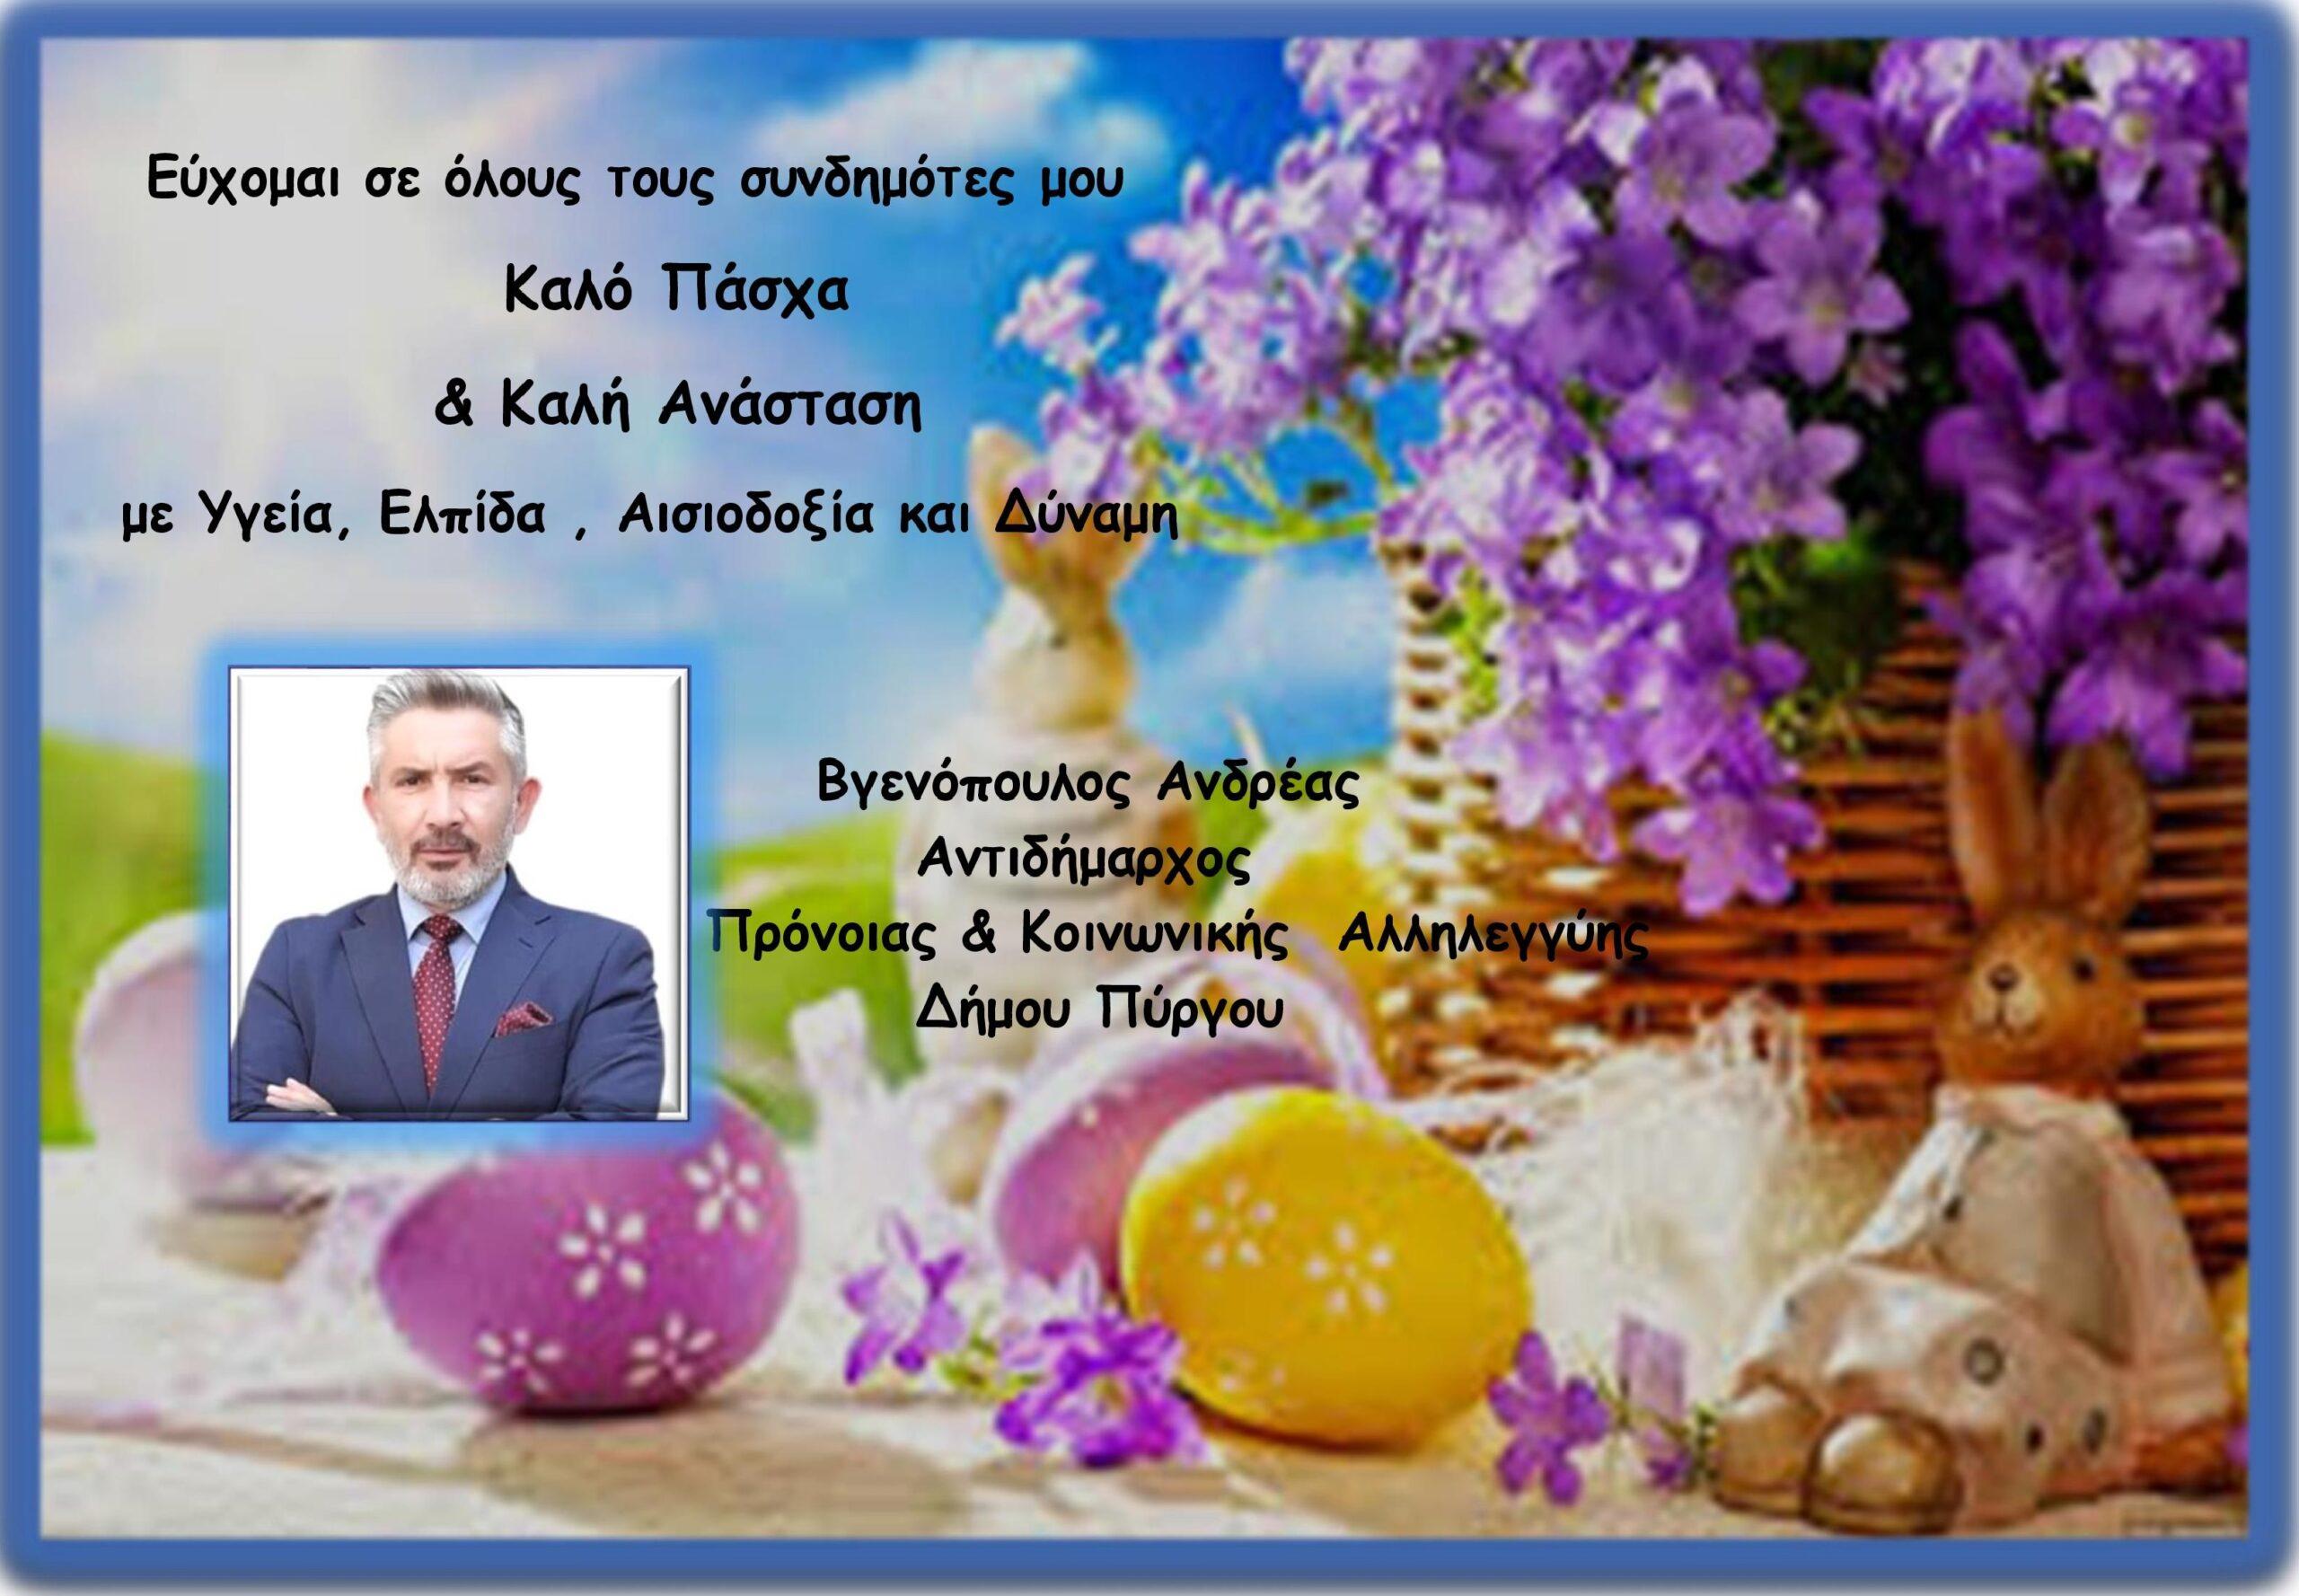 Eυχές για το Πάσχα του Αντιδημάρχου Κοινωνικής Πρόνοιας Δήμου Πύργου Ανδρέα Βγενόπουλου